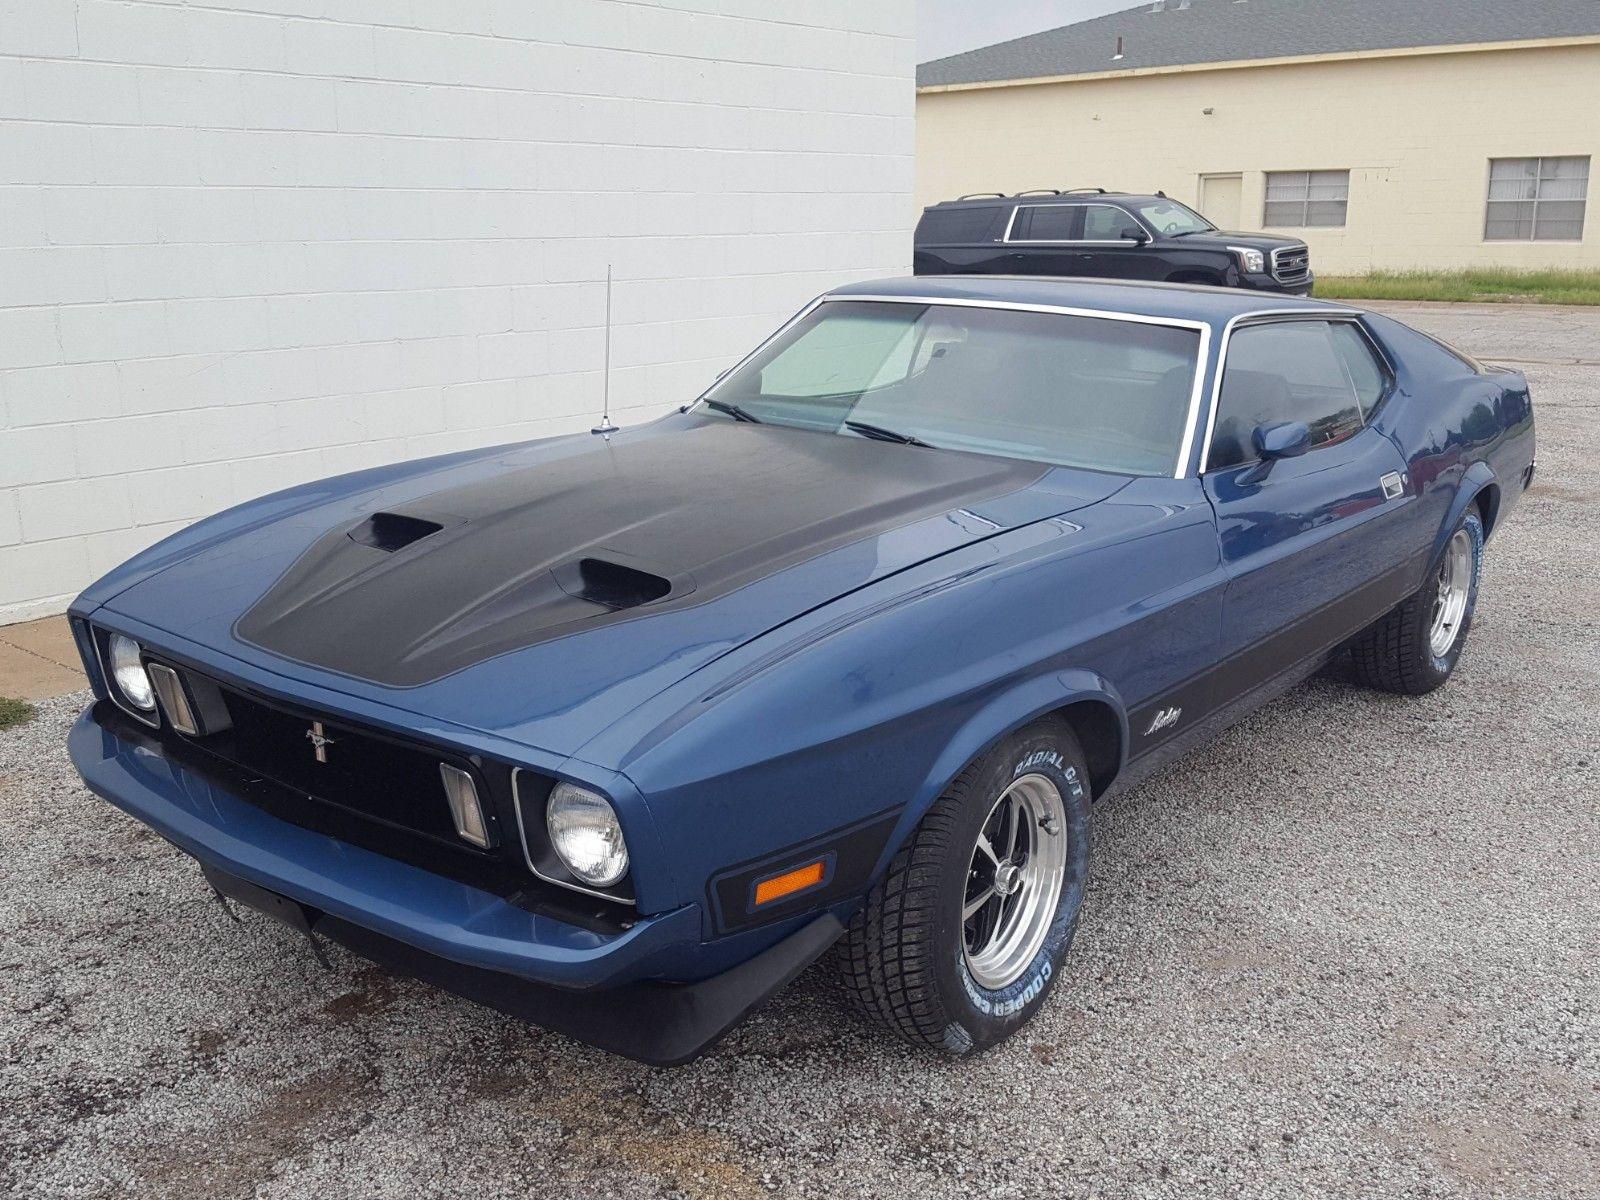 1973 Ford Mustang Fastback 351c Cobra Jet Ram Air Ac Ps Pb 2019 Mycarboard Com